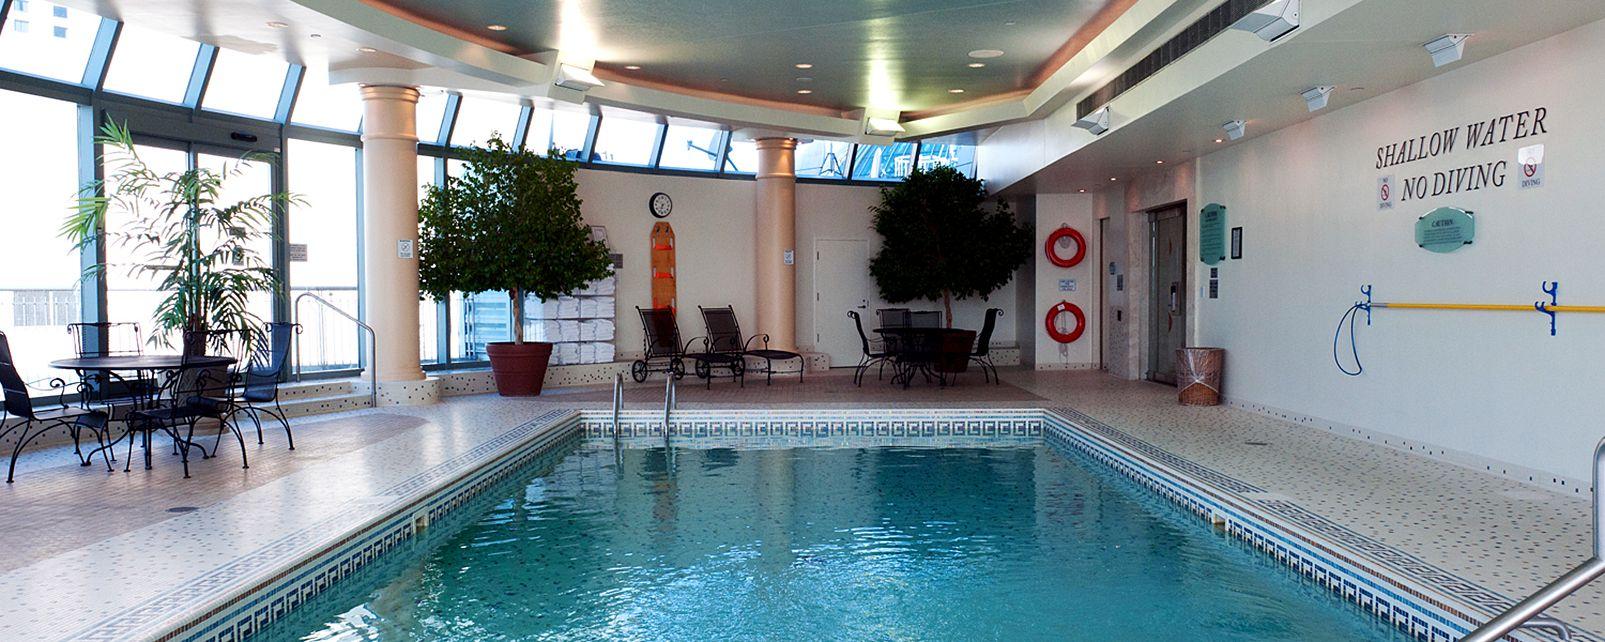 Hotel Niagara Fallsview Casino